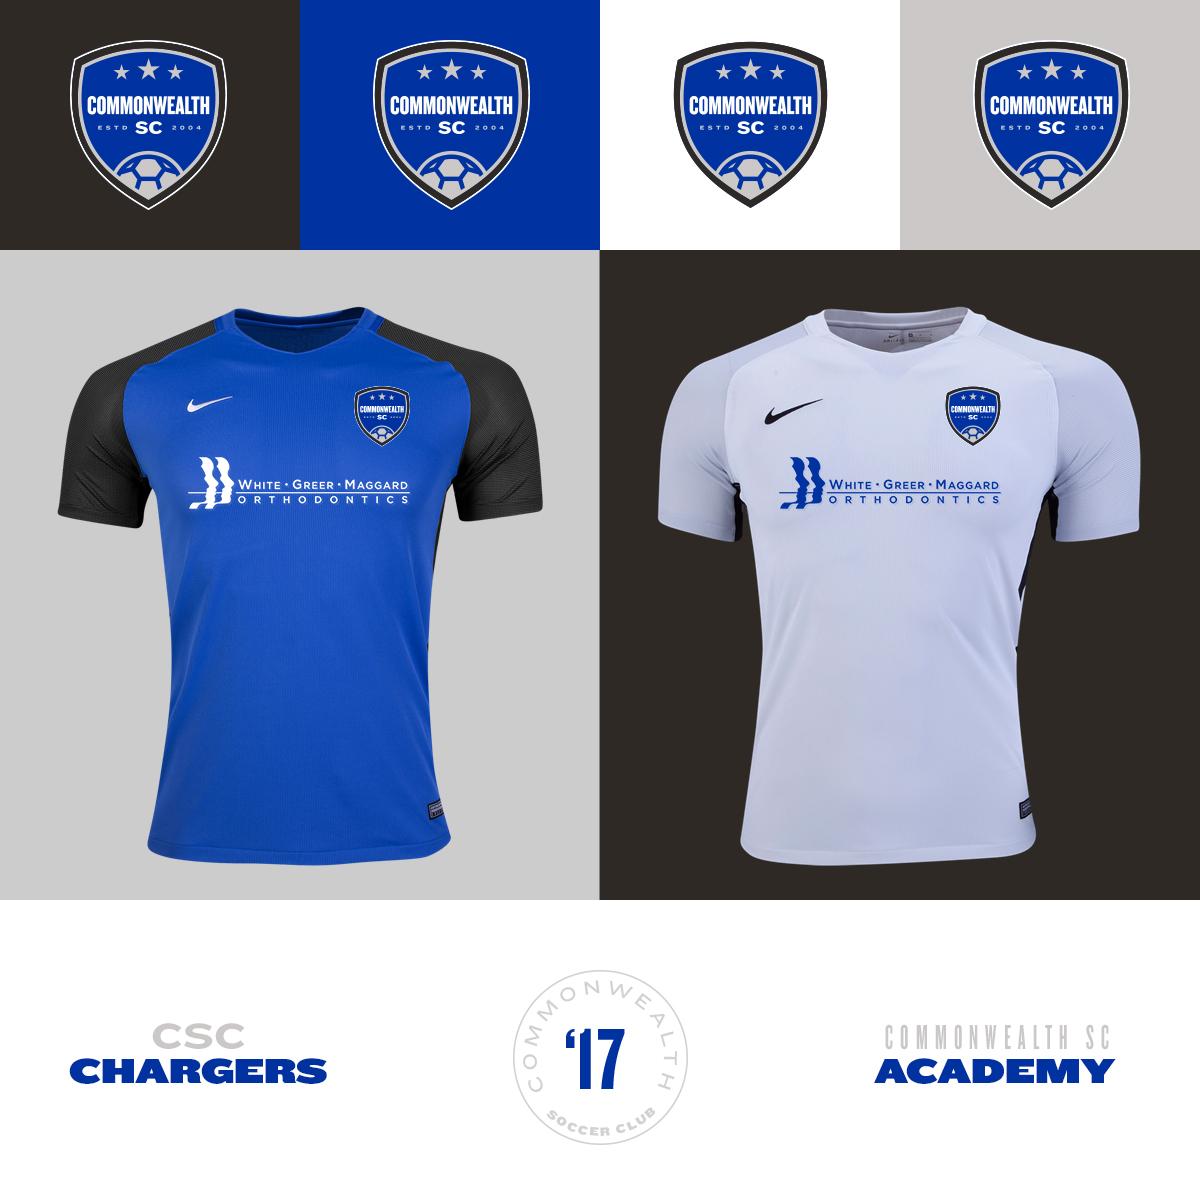 Csc 2017 branding